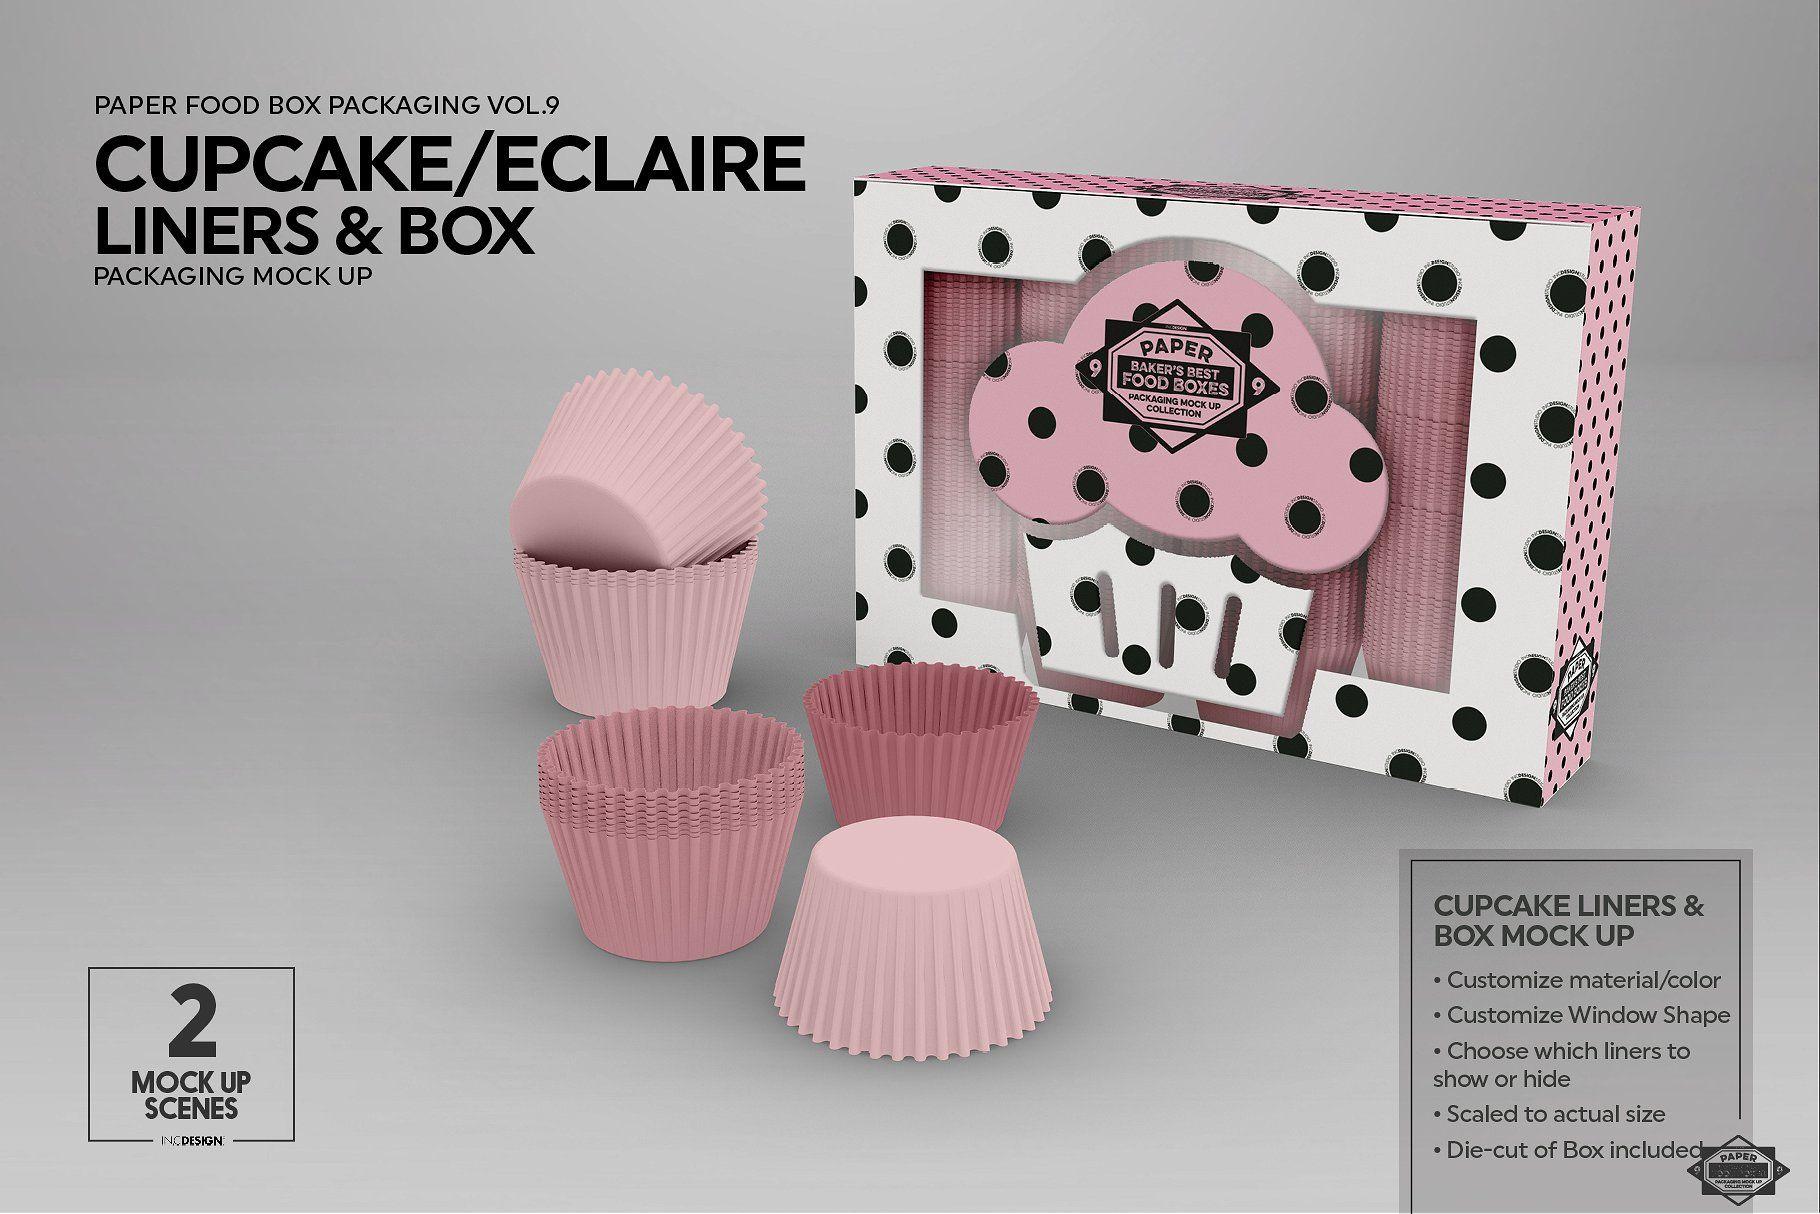 Cupcake Eclaire Liner Box Mockup Food box packaging, Box